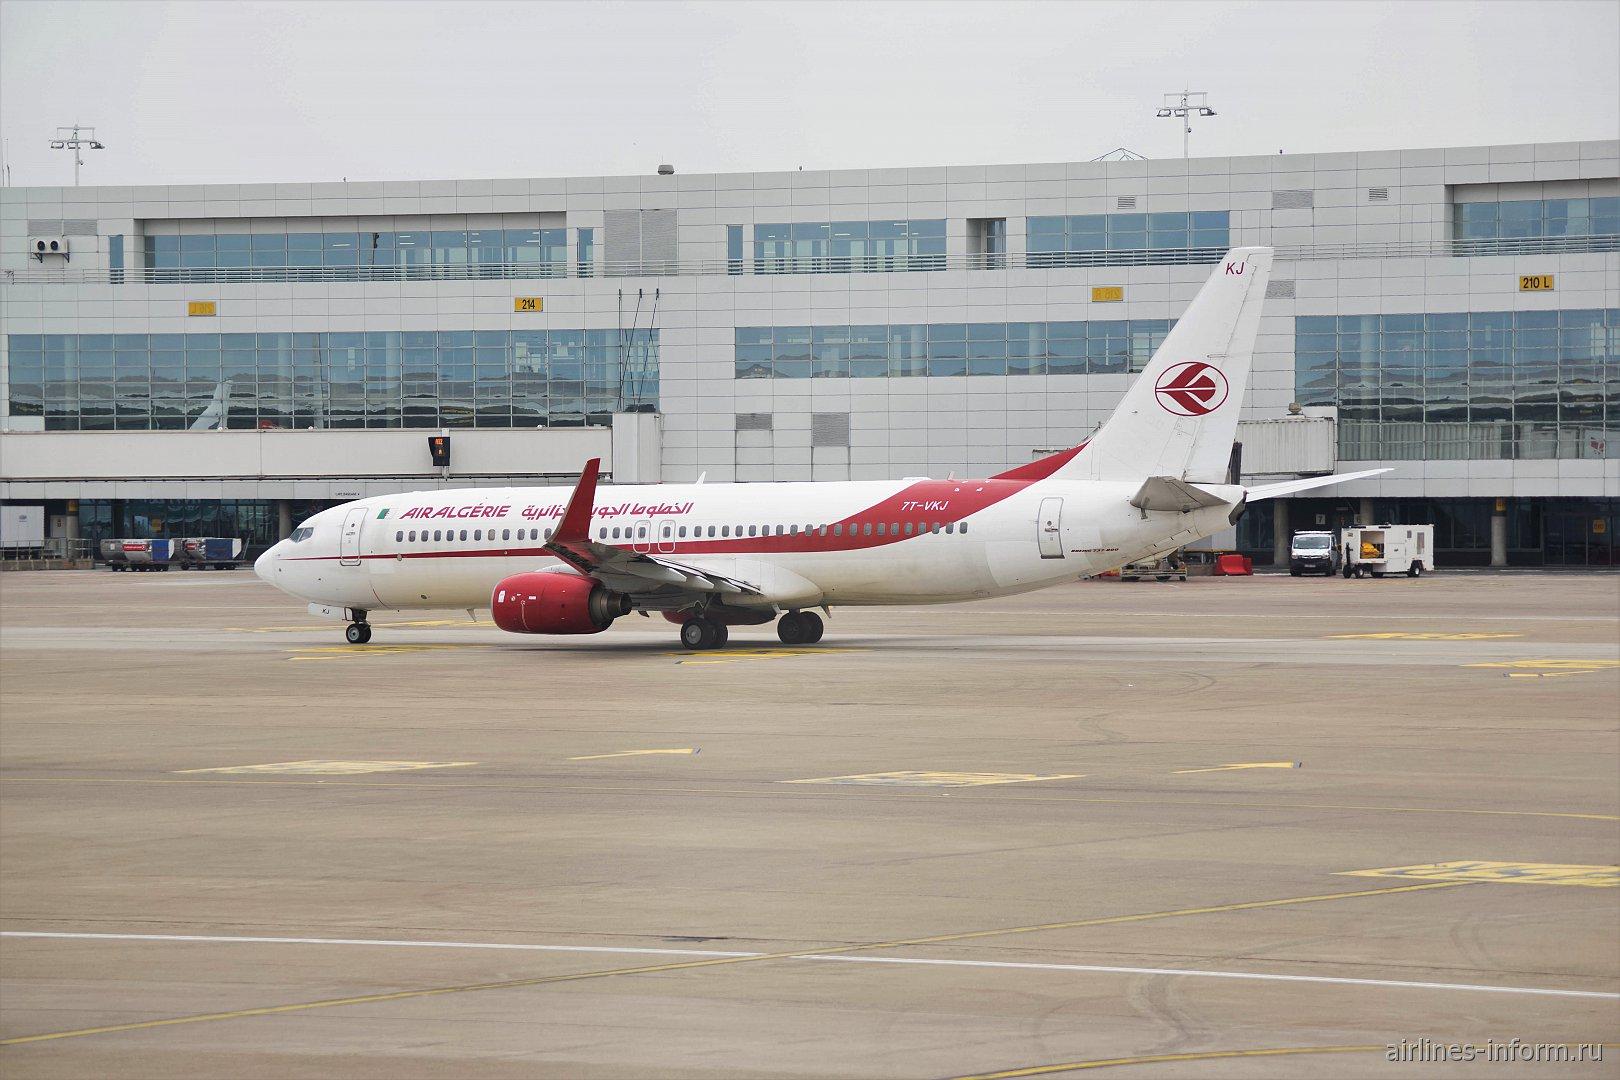 Боинг-737-800 авиакомпании Air Algerie в аэропорту Брюсселя